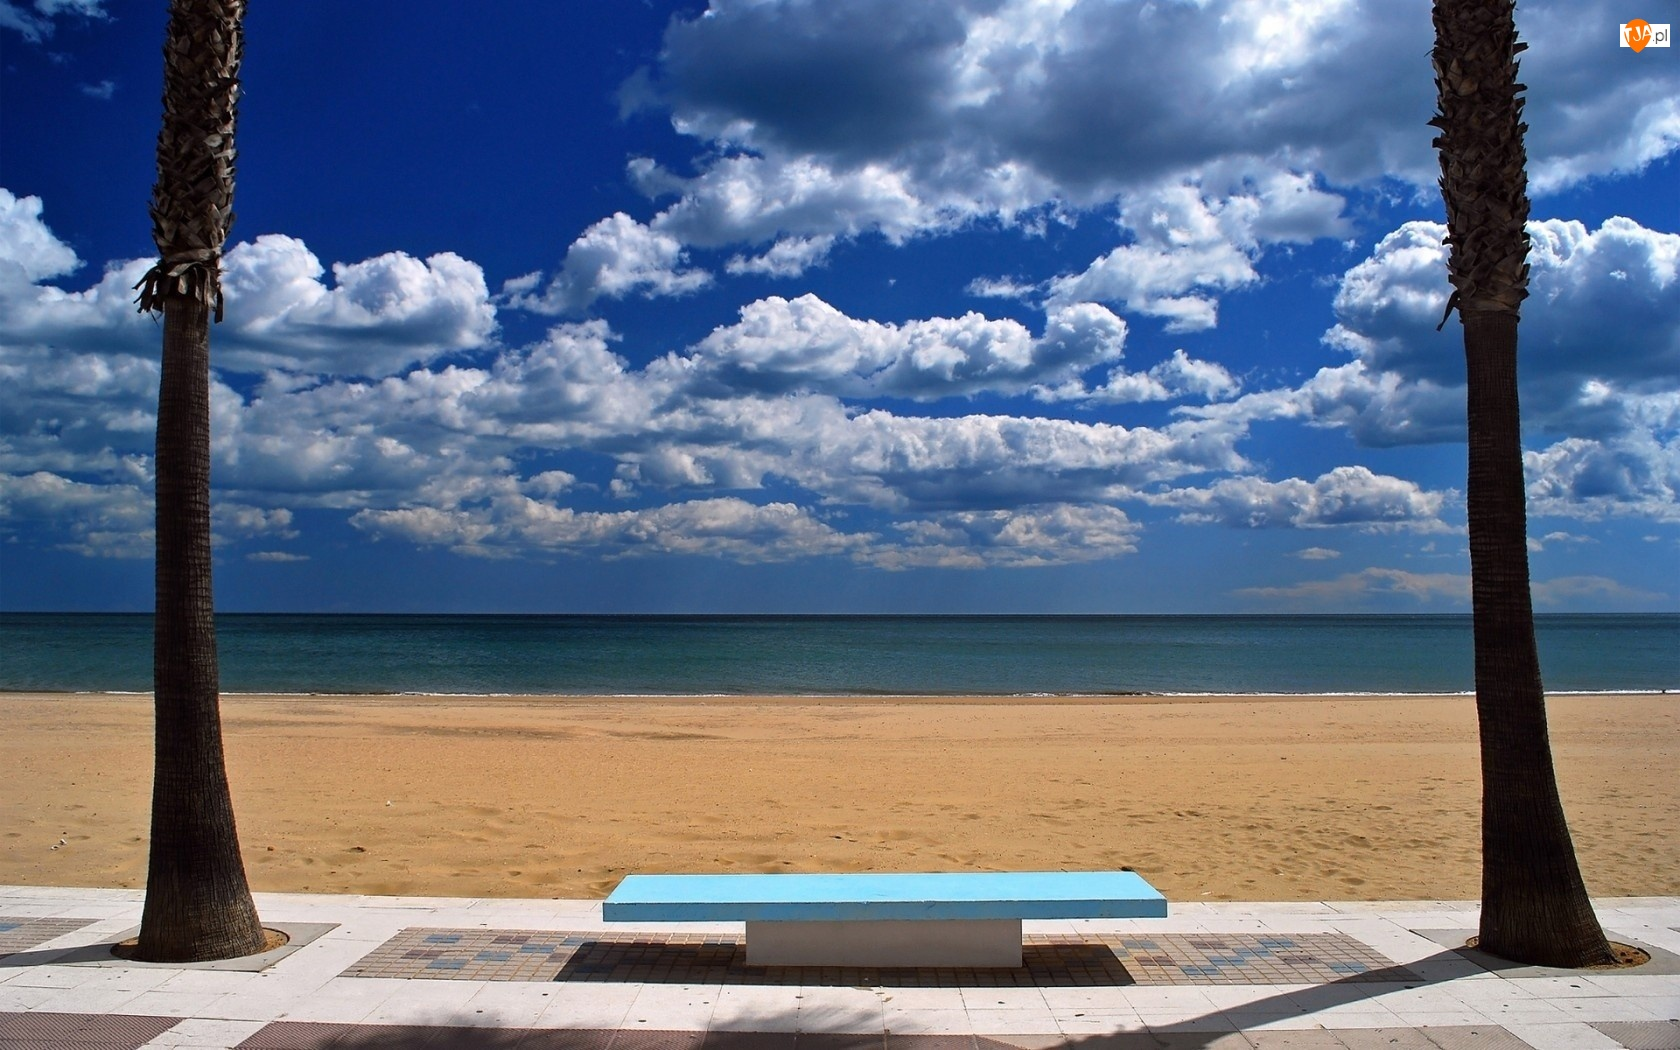 Chmury, Morze, Plaża